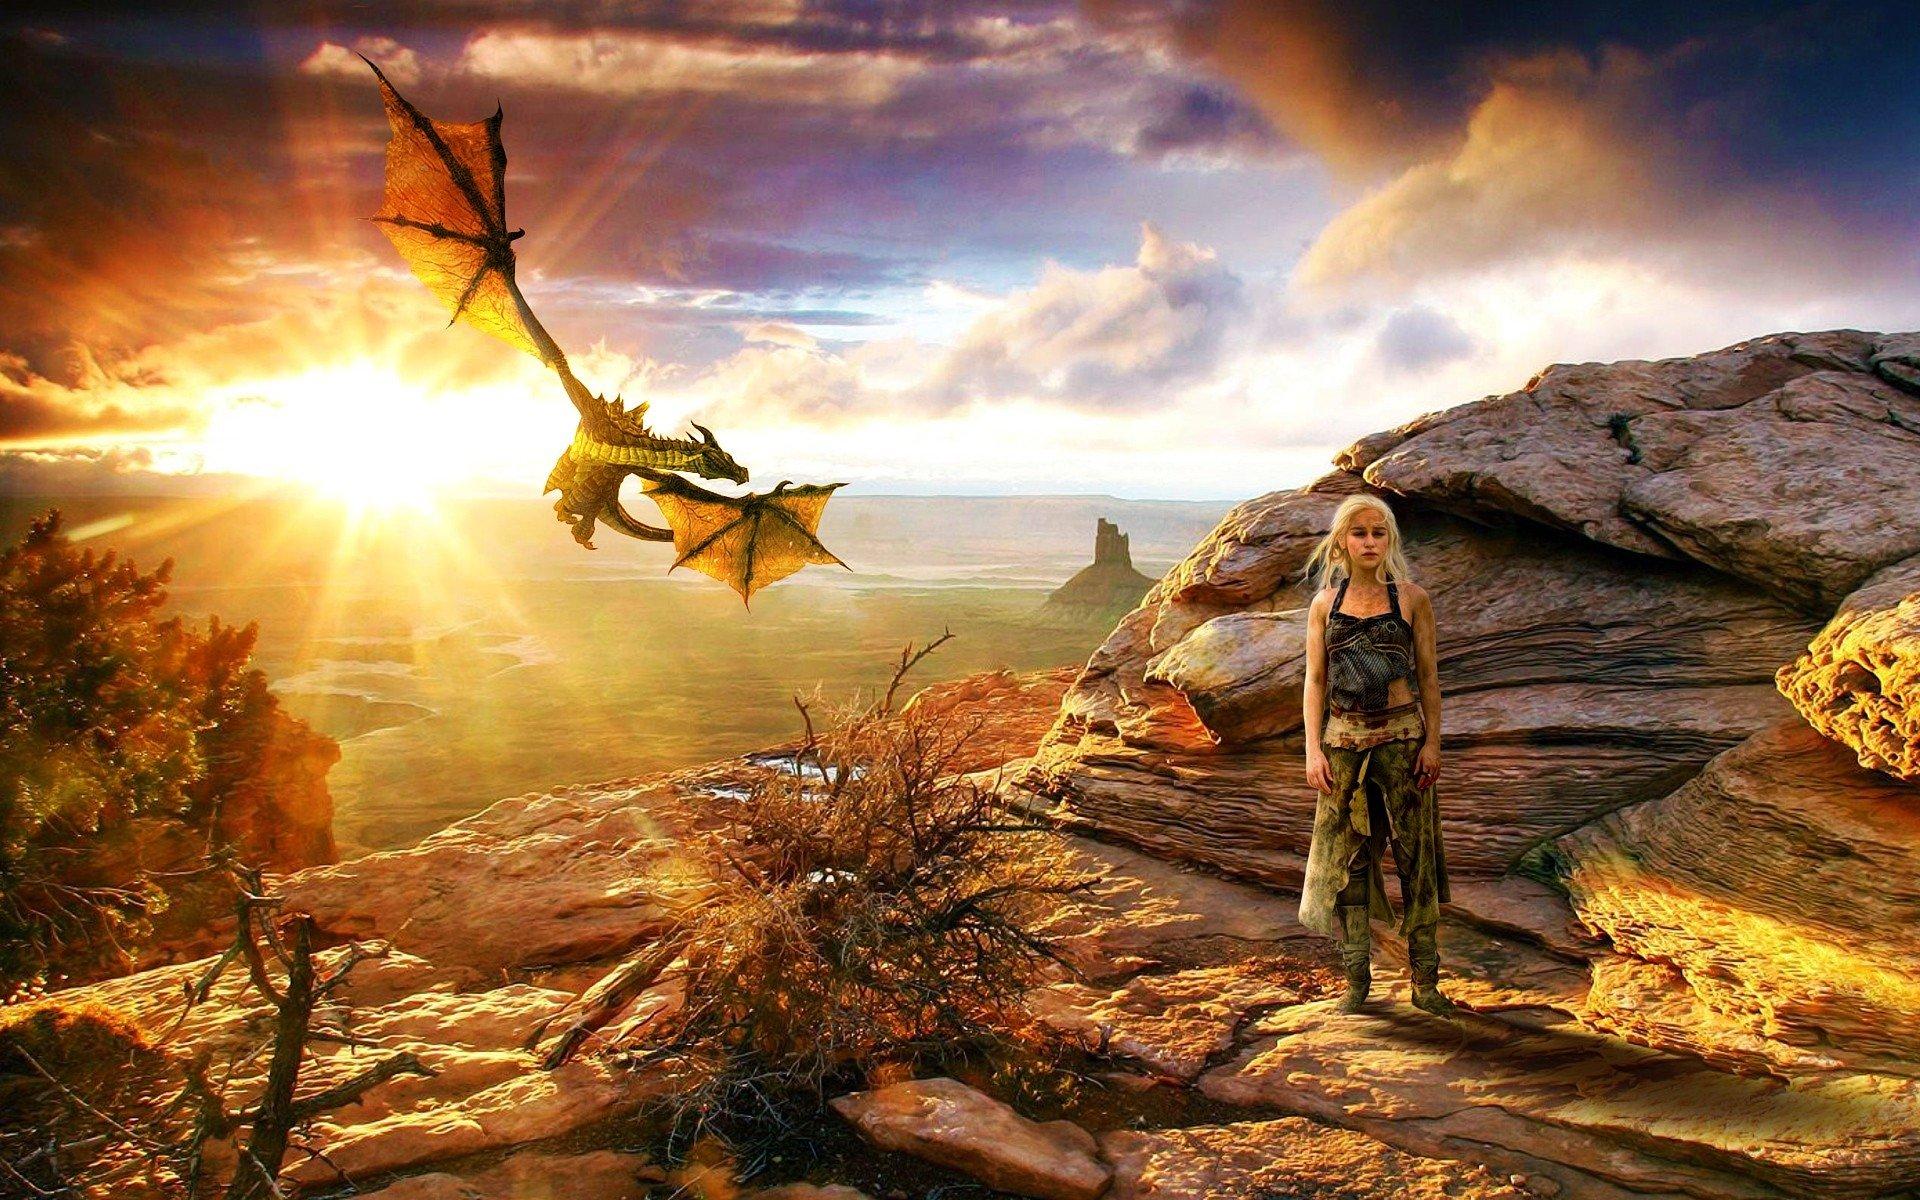 2560x1600 Pubg Game Girl Fanart 2560x1600 Resolution Hd 4k: Fondos De Pantalla De Khaleesi, Daenerys Targaryen Wallpapers